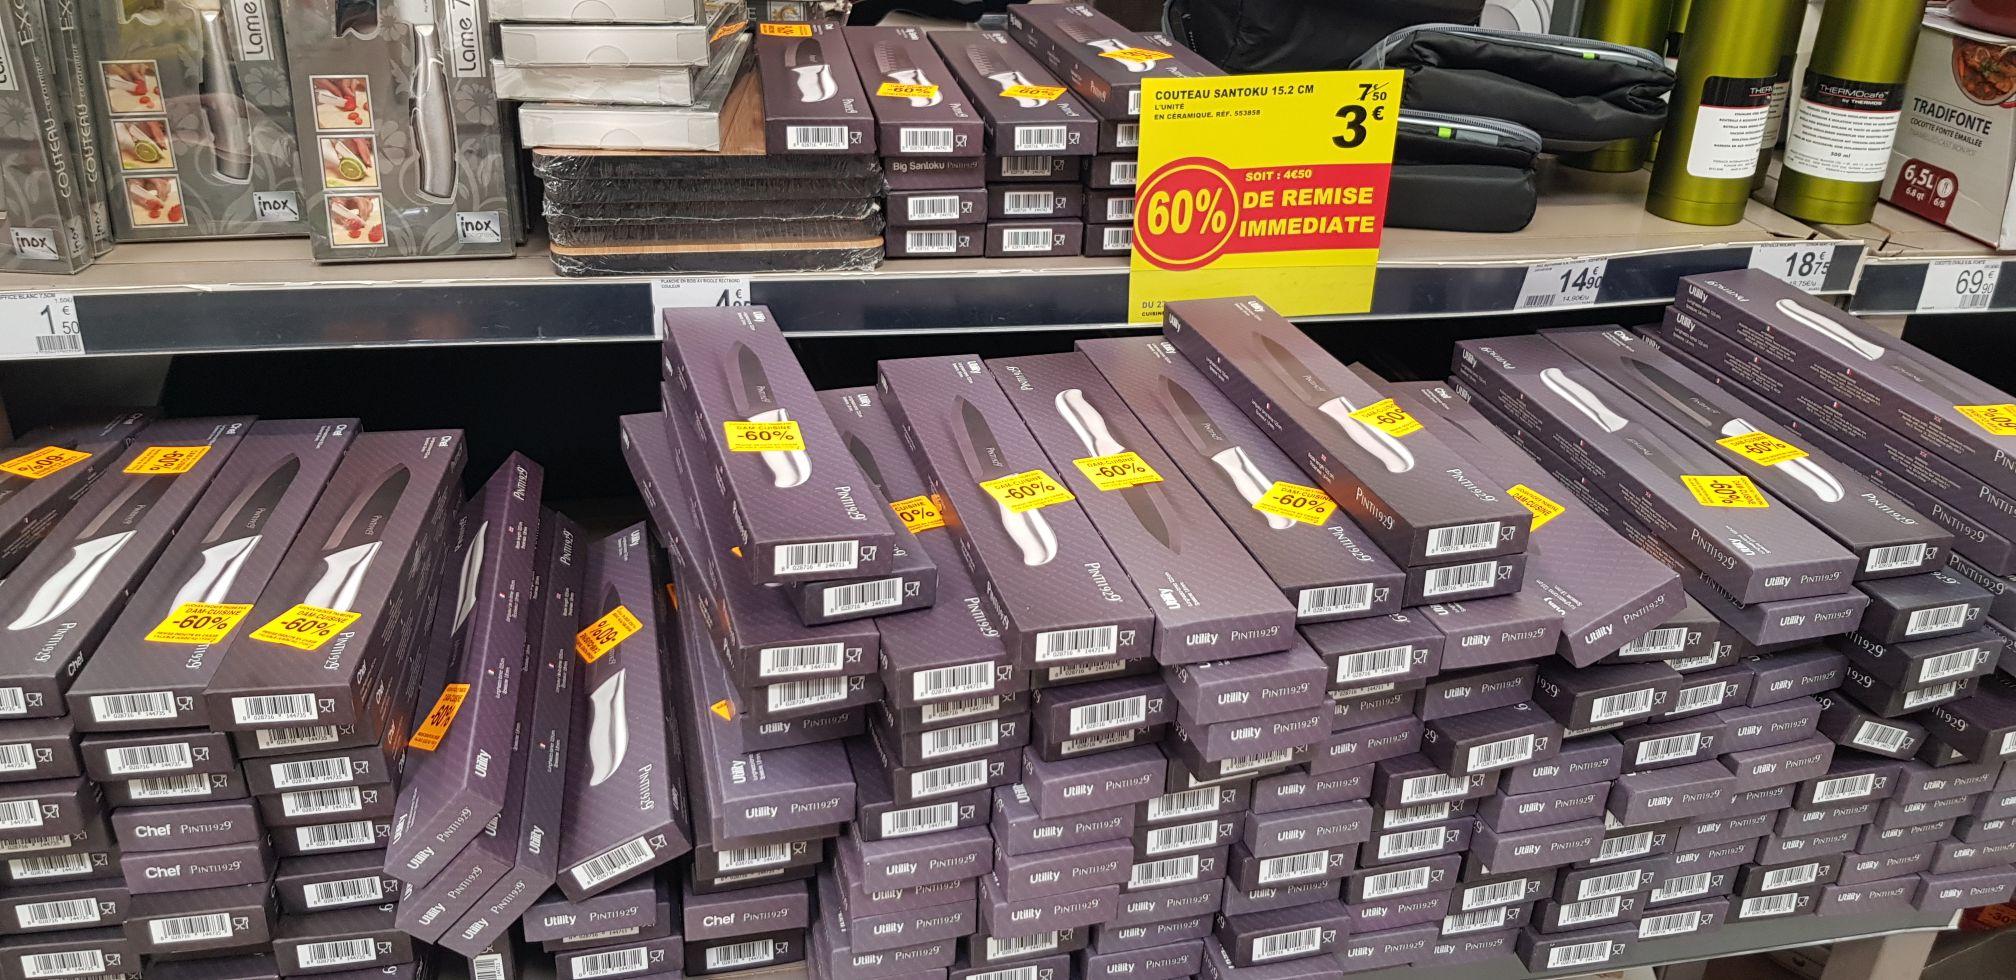 Couteau Utility, Chef ou Santoku en Ceramique - Auchan Fache (59)